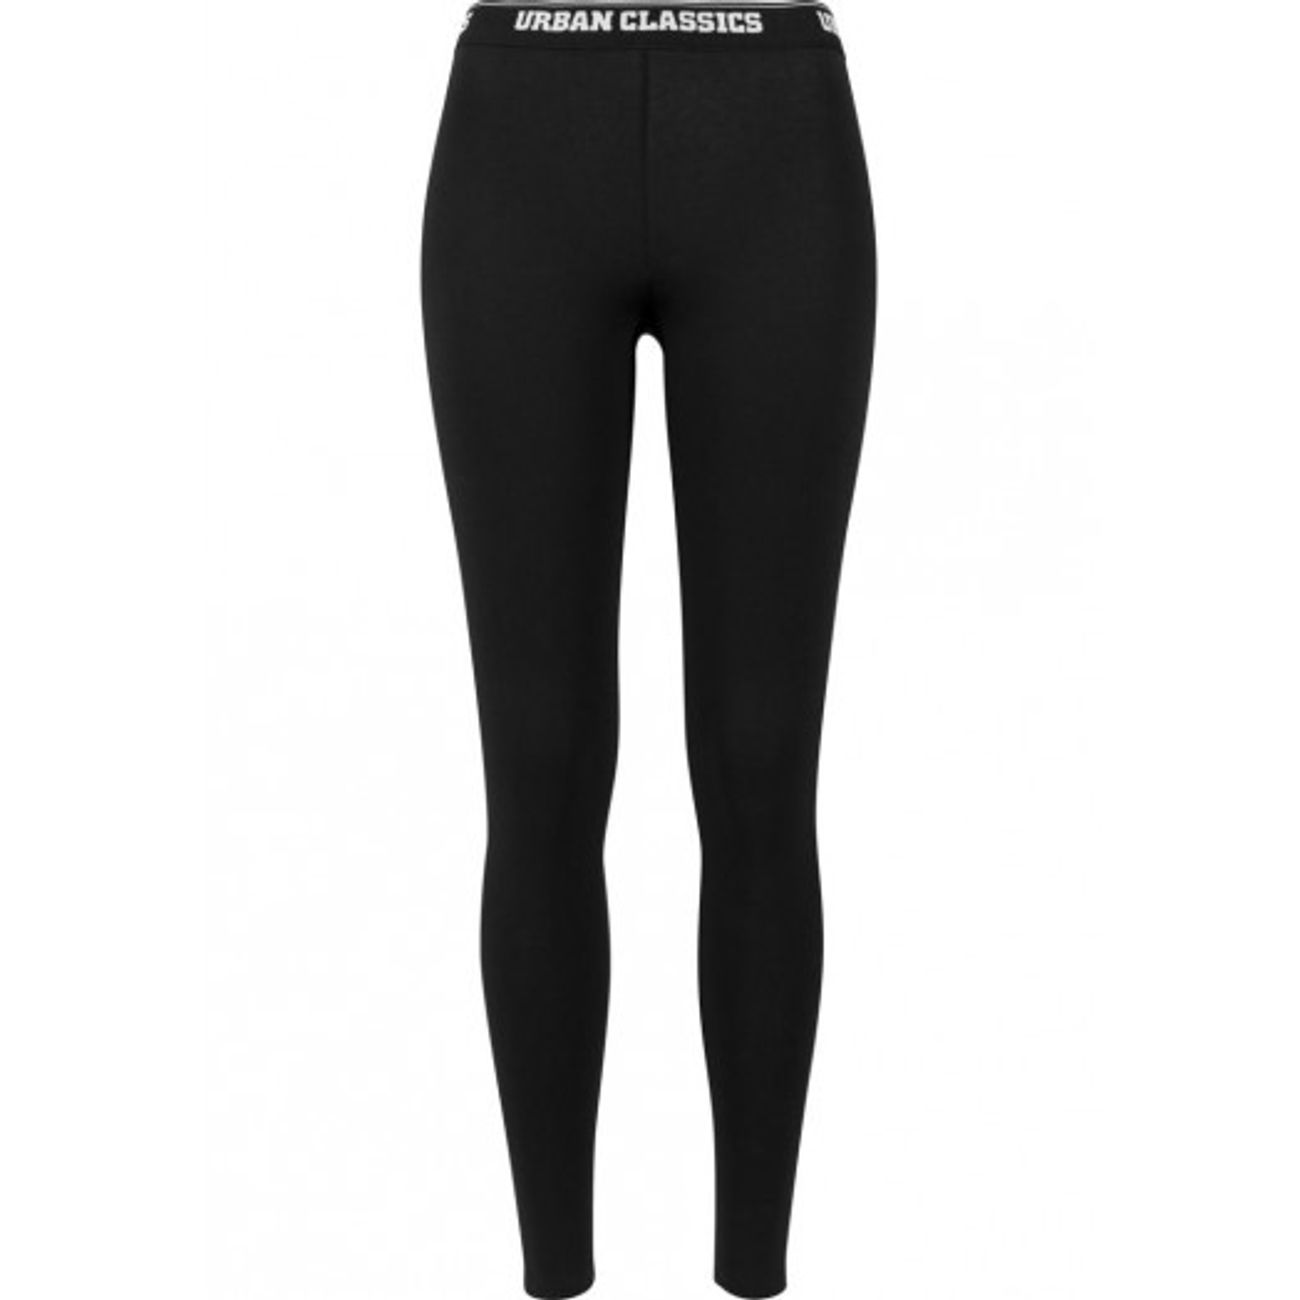 ModeLifestyle Urban Femme Classics Legging Logo Noir Elastique rxhdtsQC